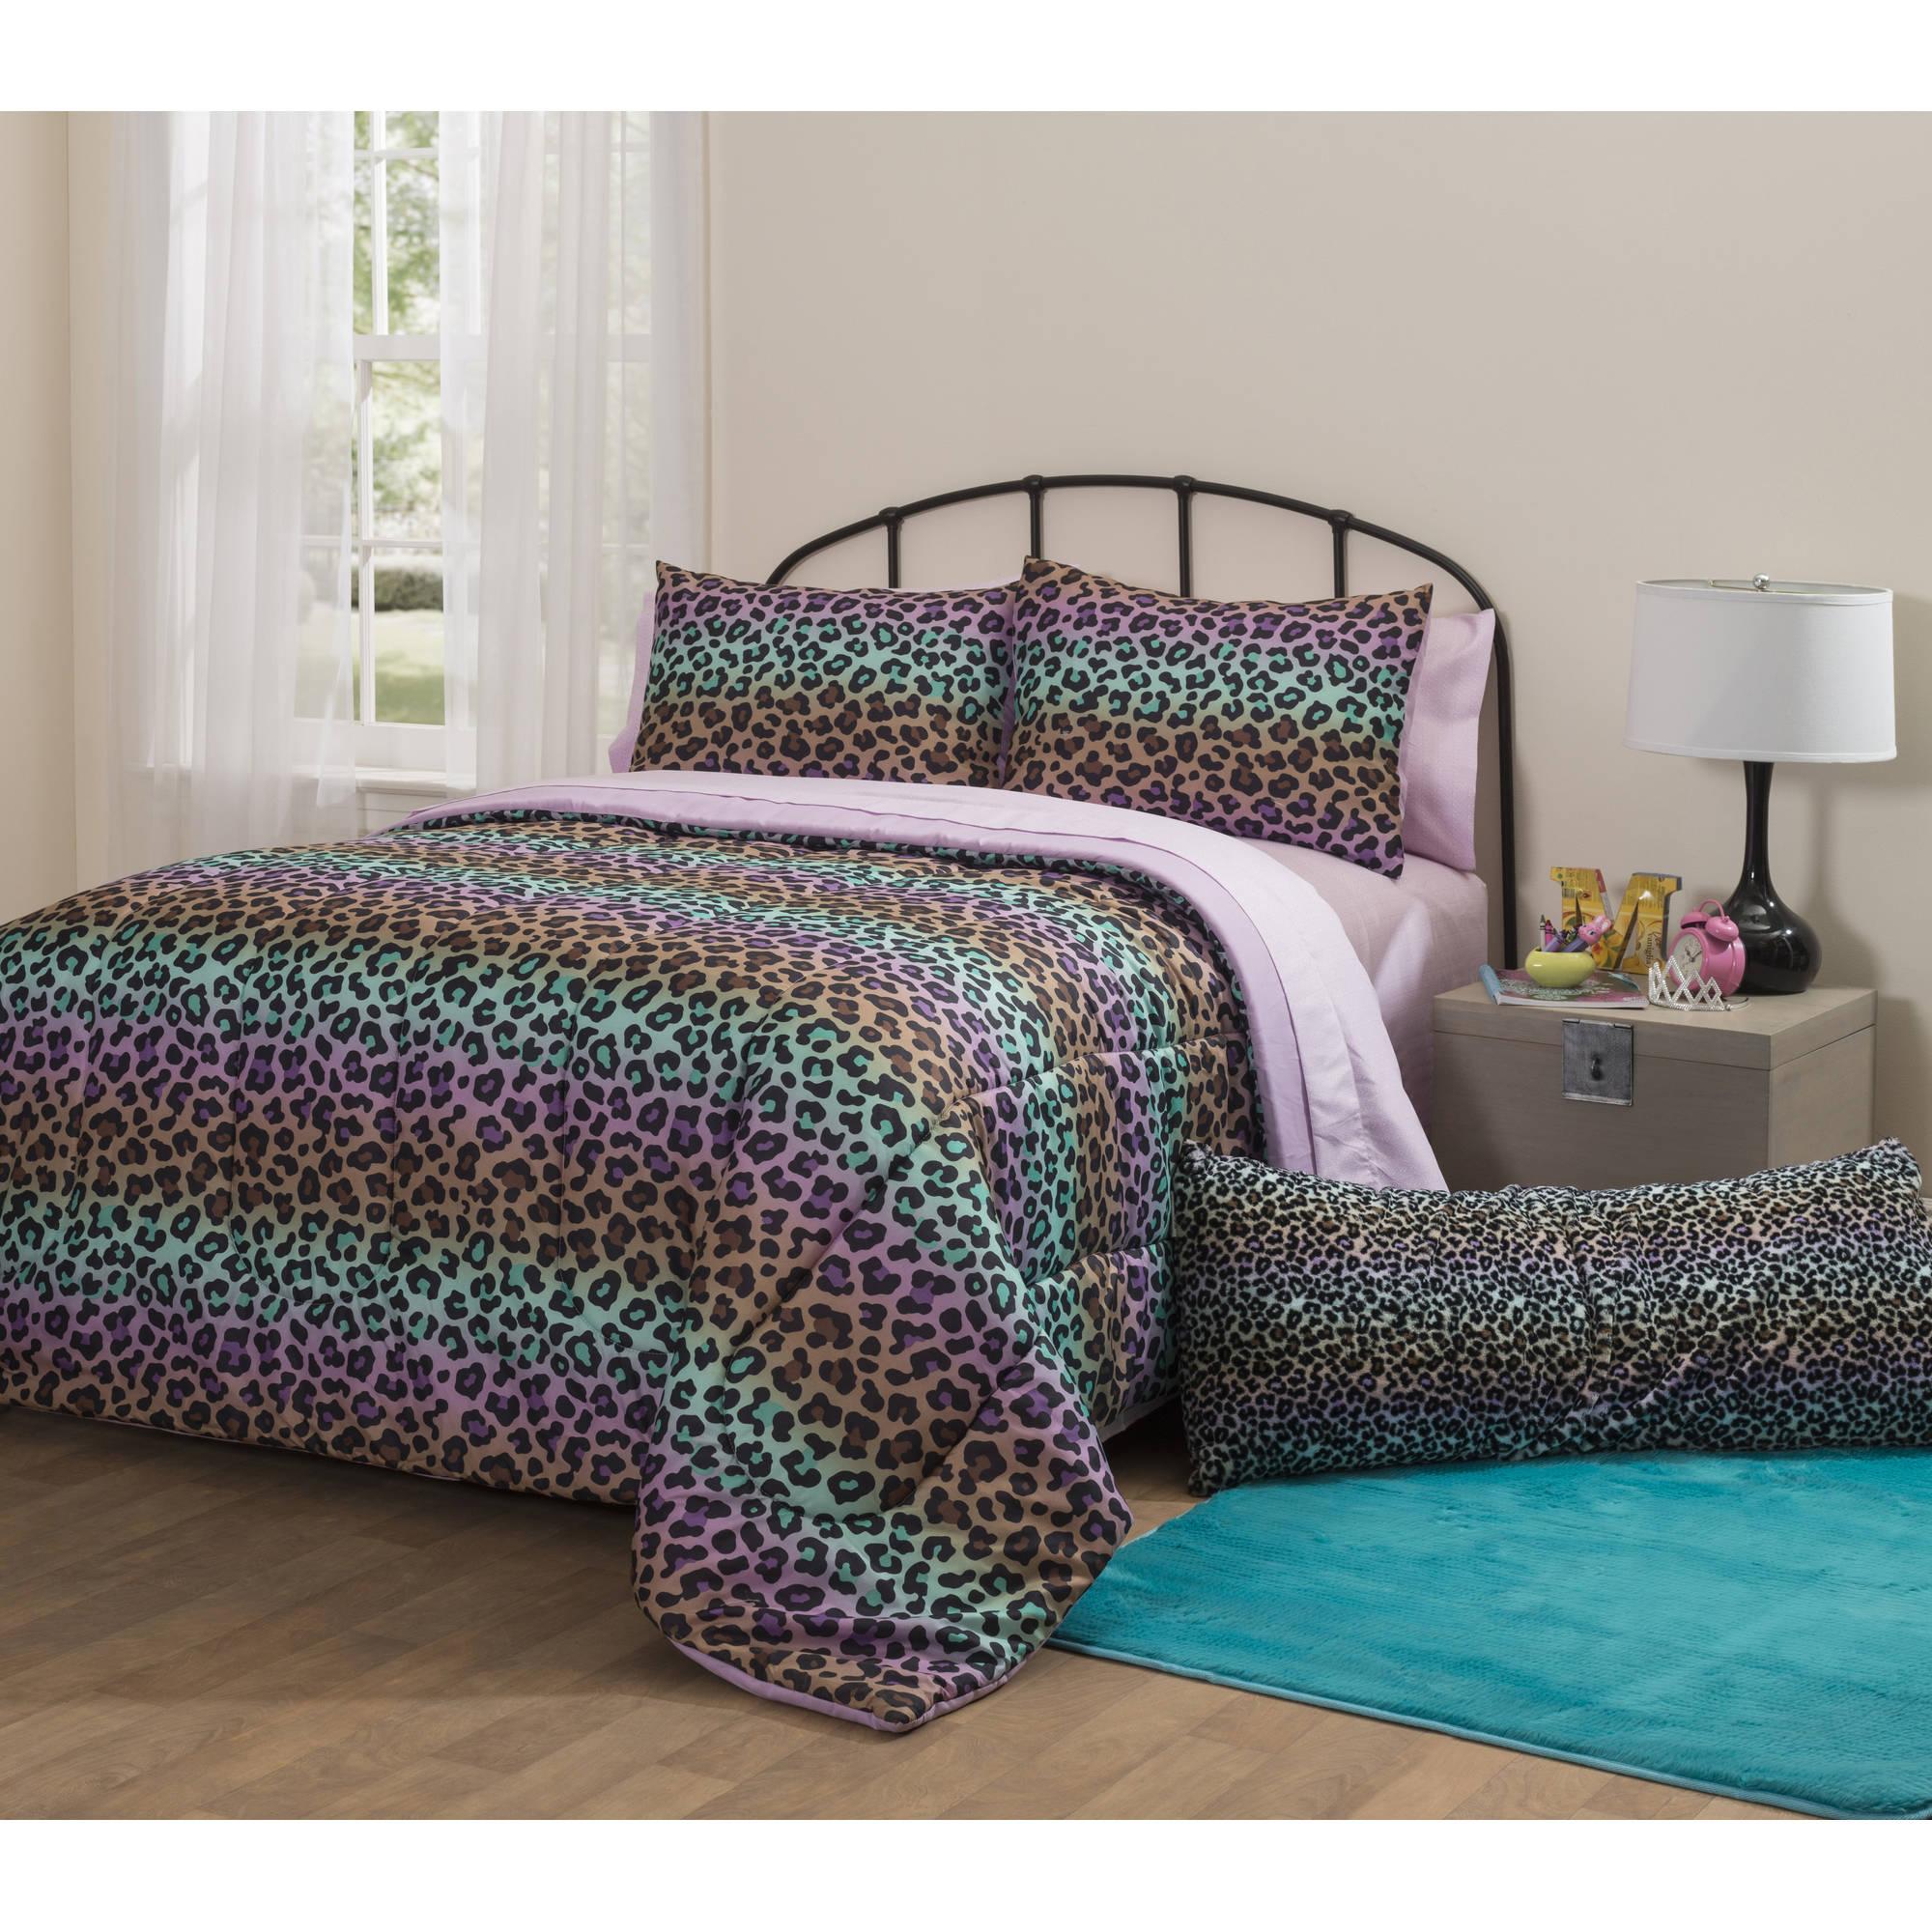 Idea Nuova Latitude Ombre Cheetah Bed in a Bag Bedding Set